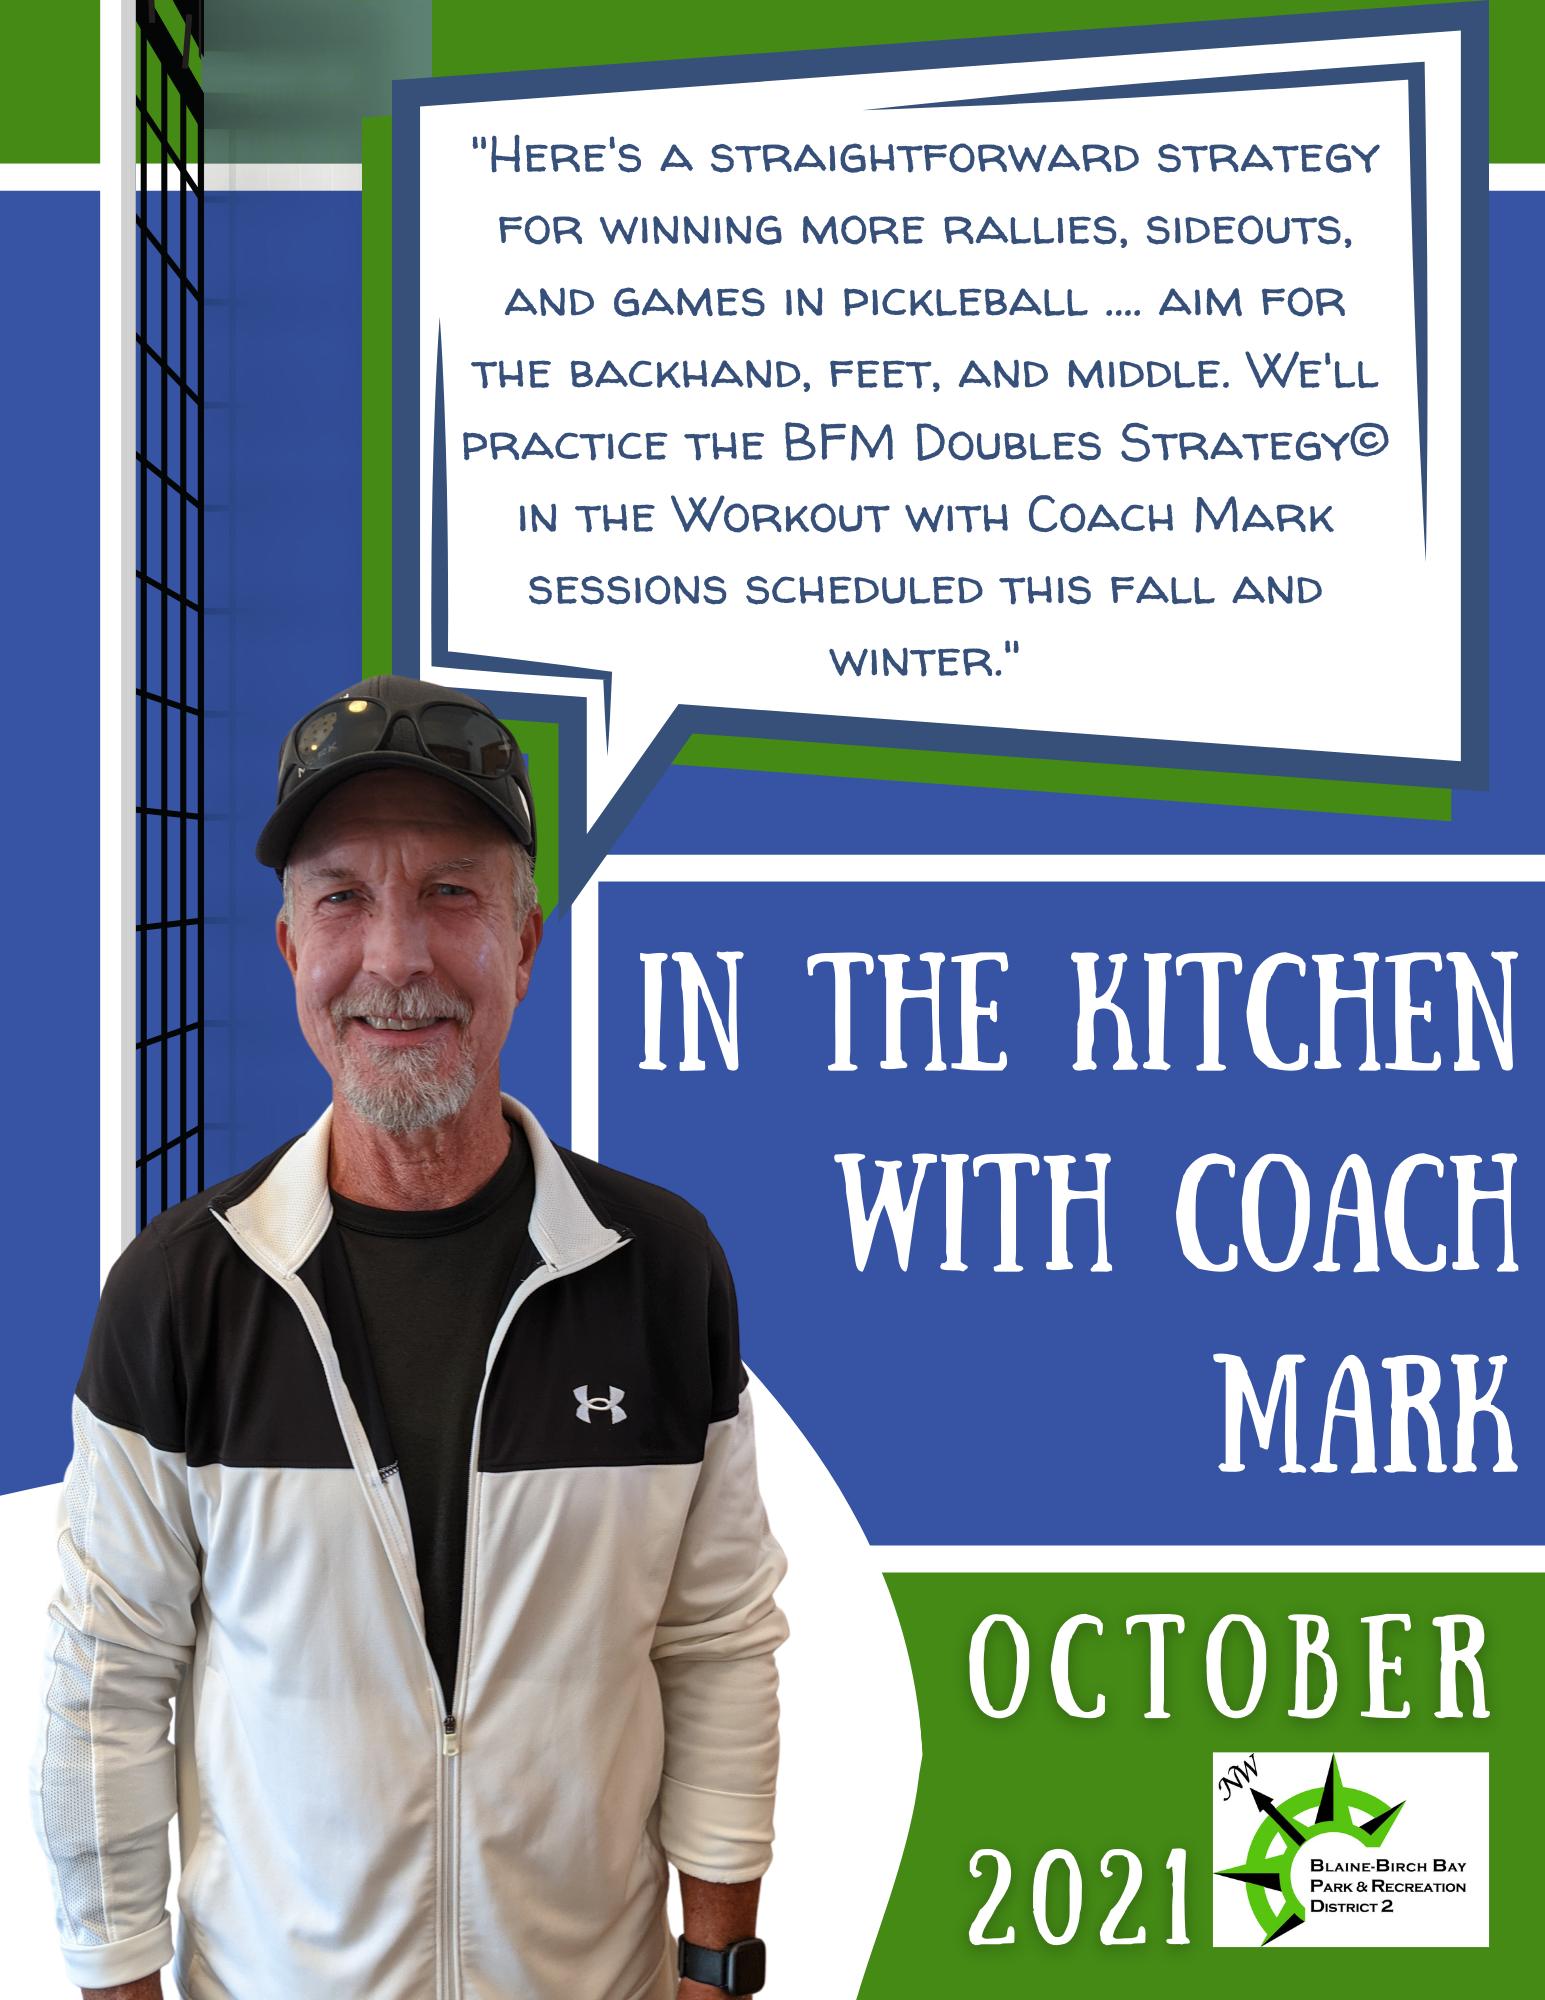 Copy of coach mark's advice